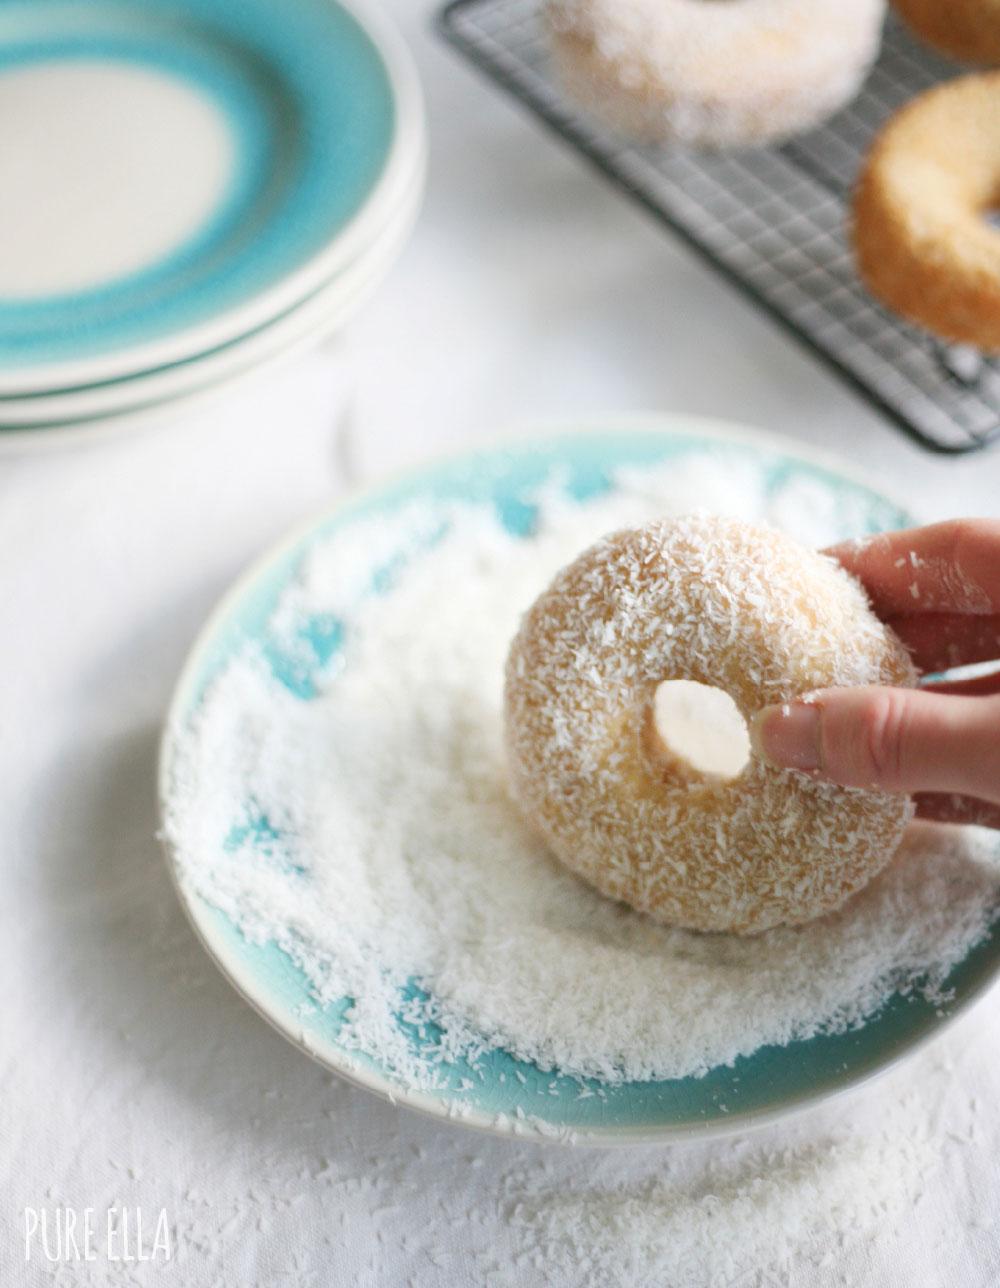 Pure-Ella-gluten-free-vegan-coconut-vanilla-donuts-so-delicious10